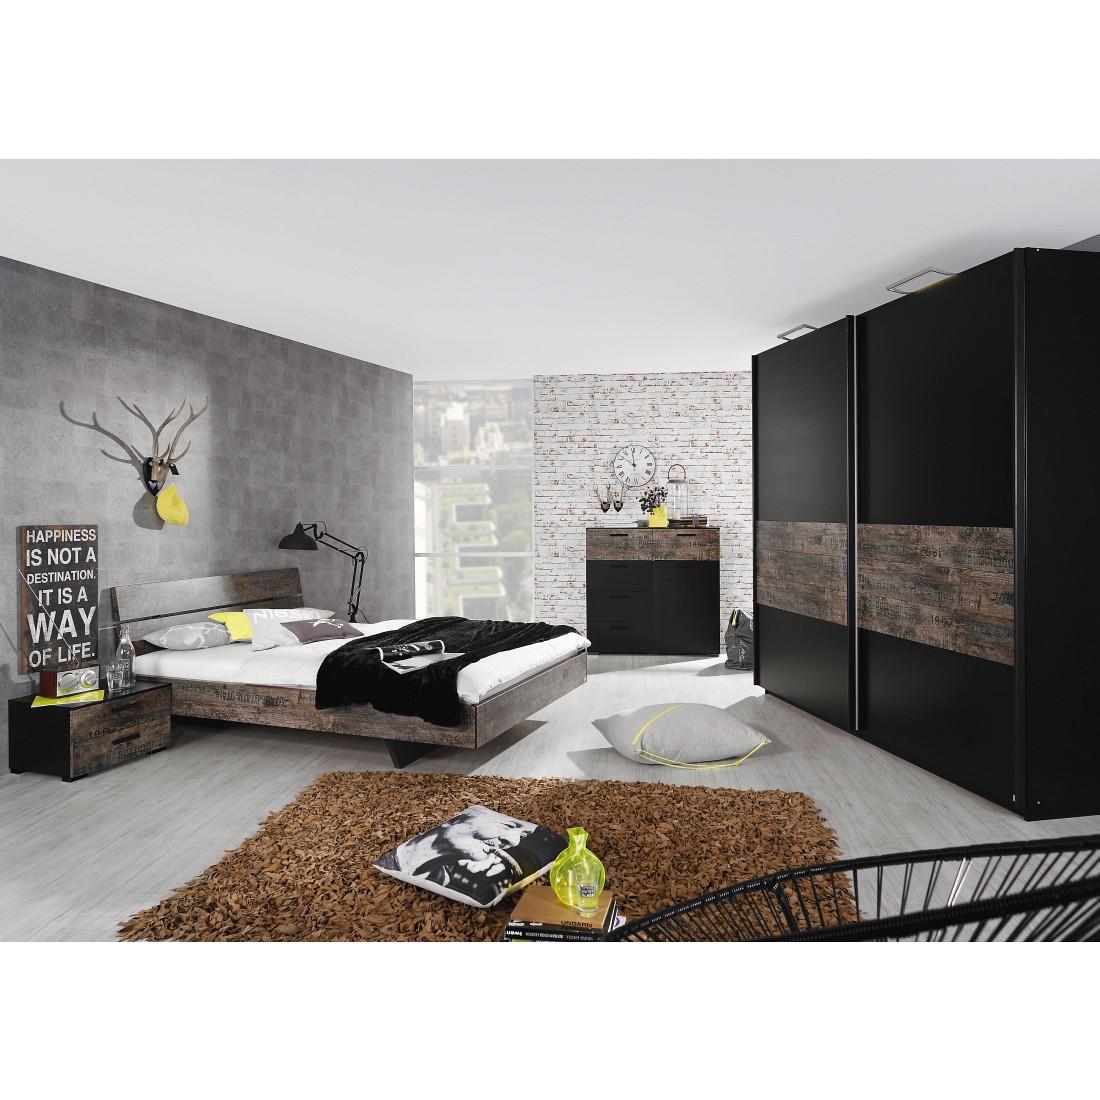 Slaapkamerset Vintage Factory - zwart/vintage bruin - ligoppervlak bed: 140x200cm, Rauch Select